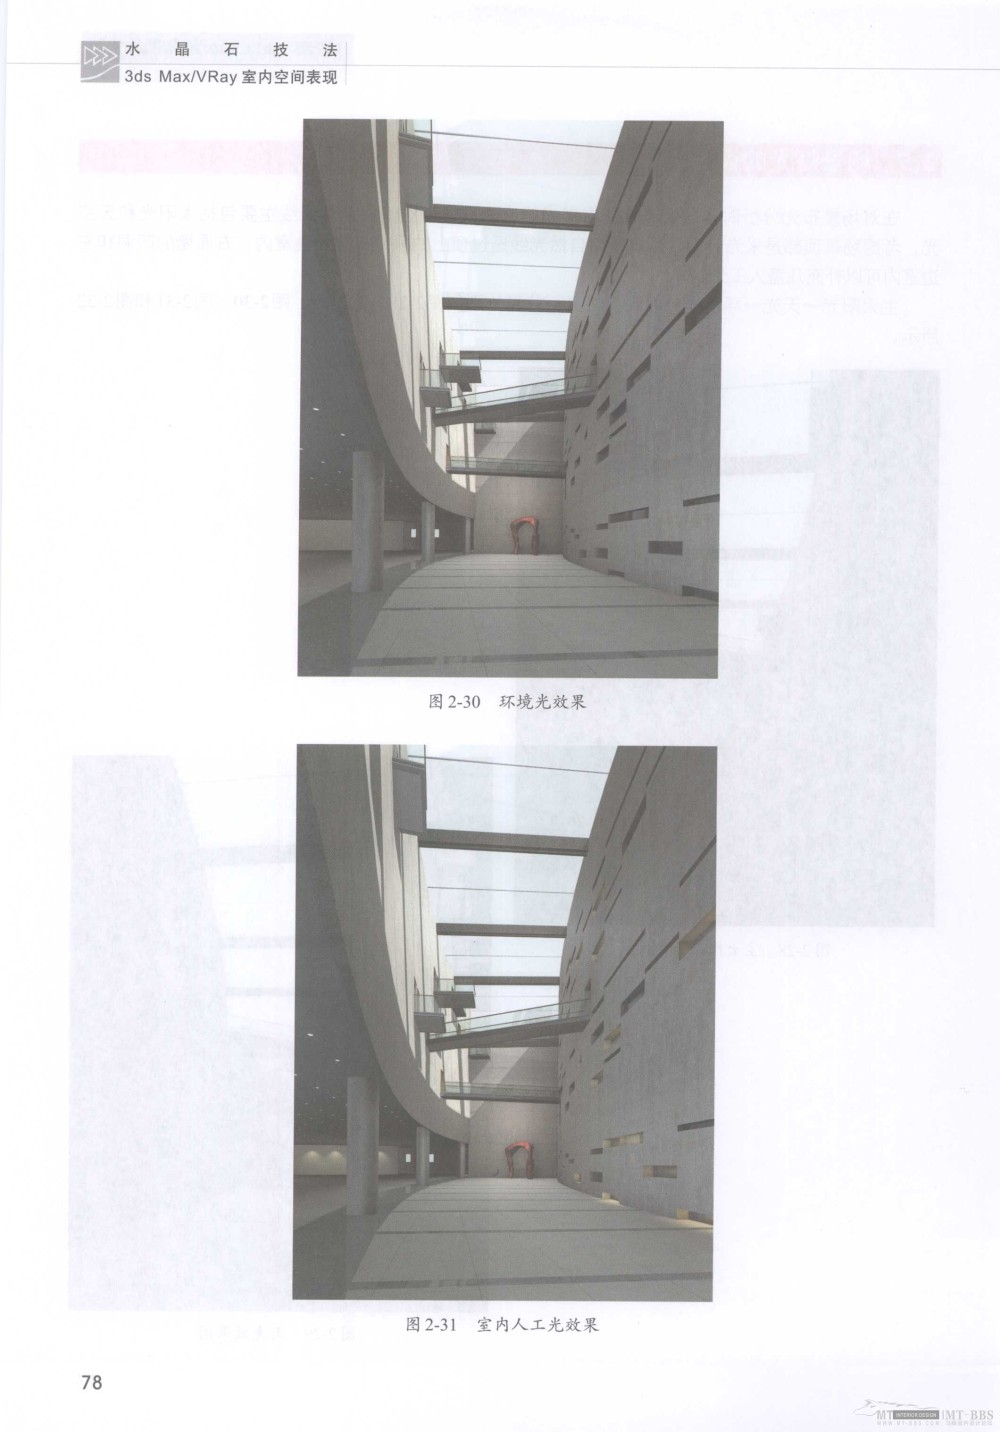 水晶石技法-3ds_Max&VRay室内空间表现_水晶石技法-3ds_Max&VRay室内空间表现_页面_084.jpg